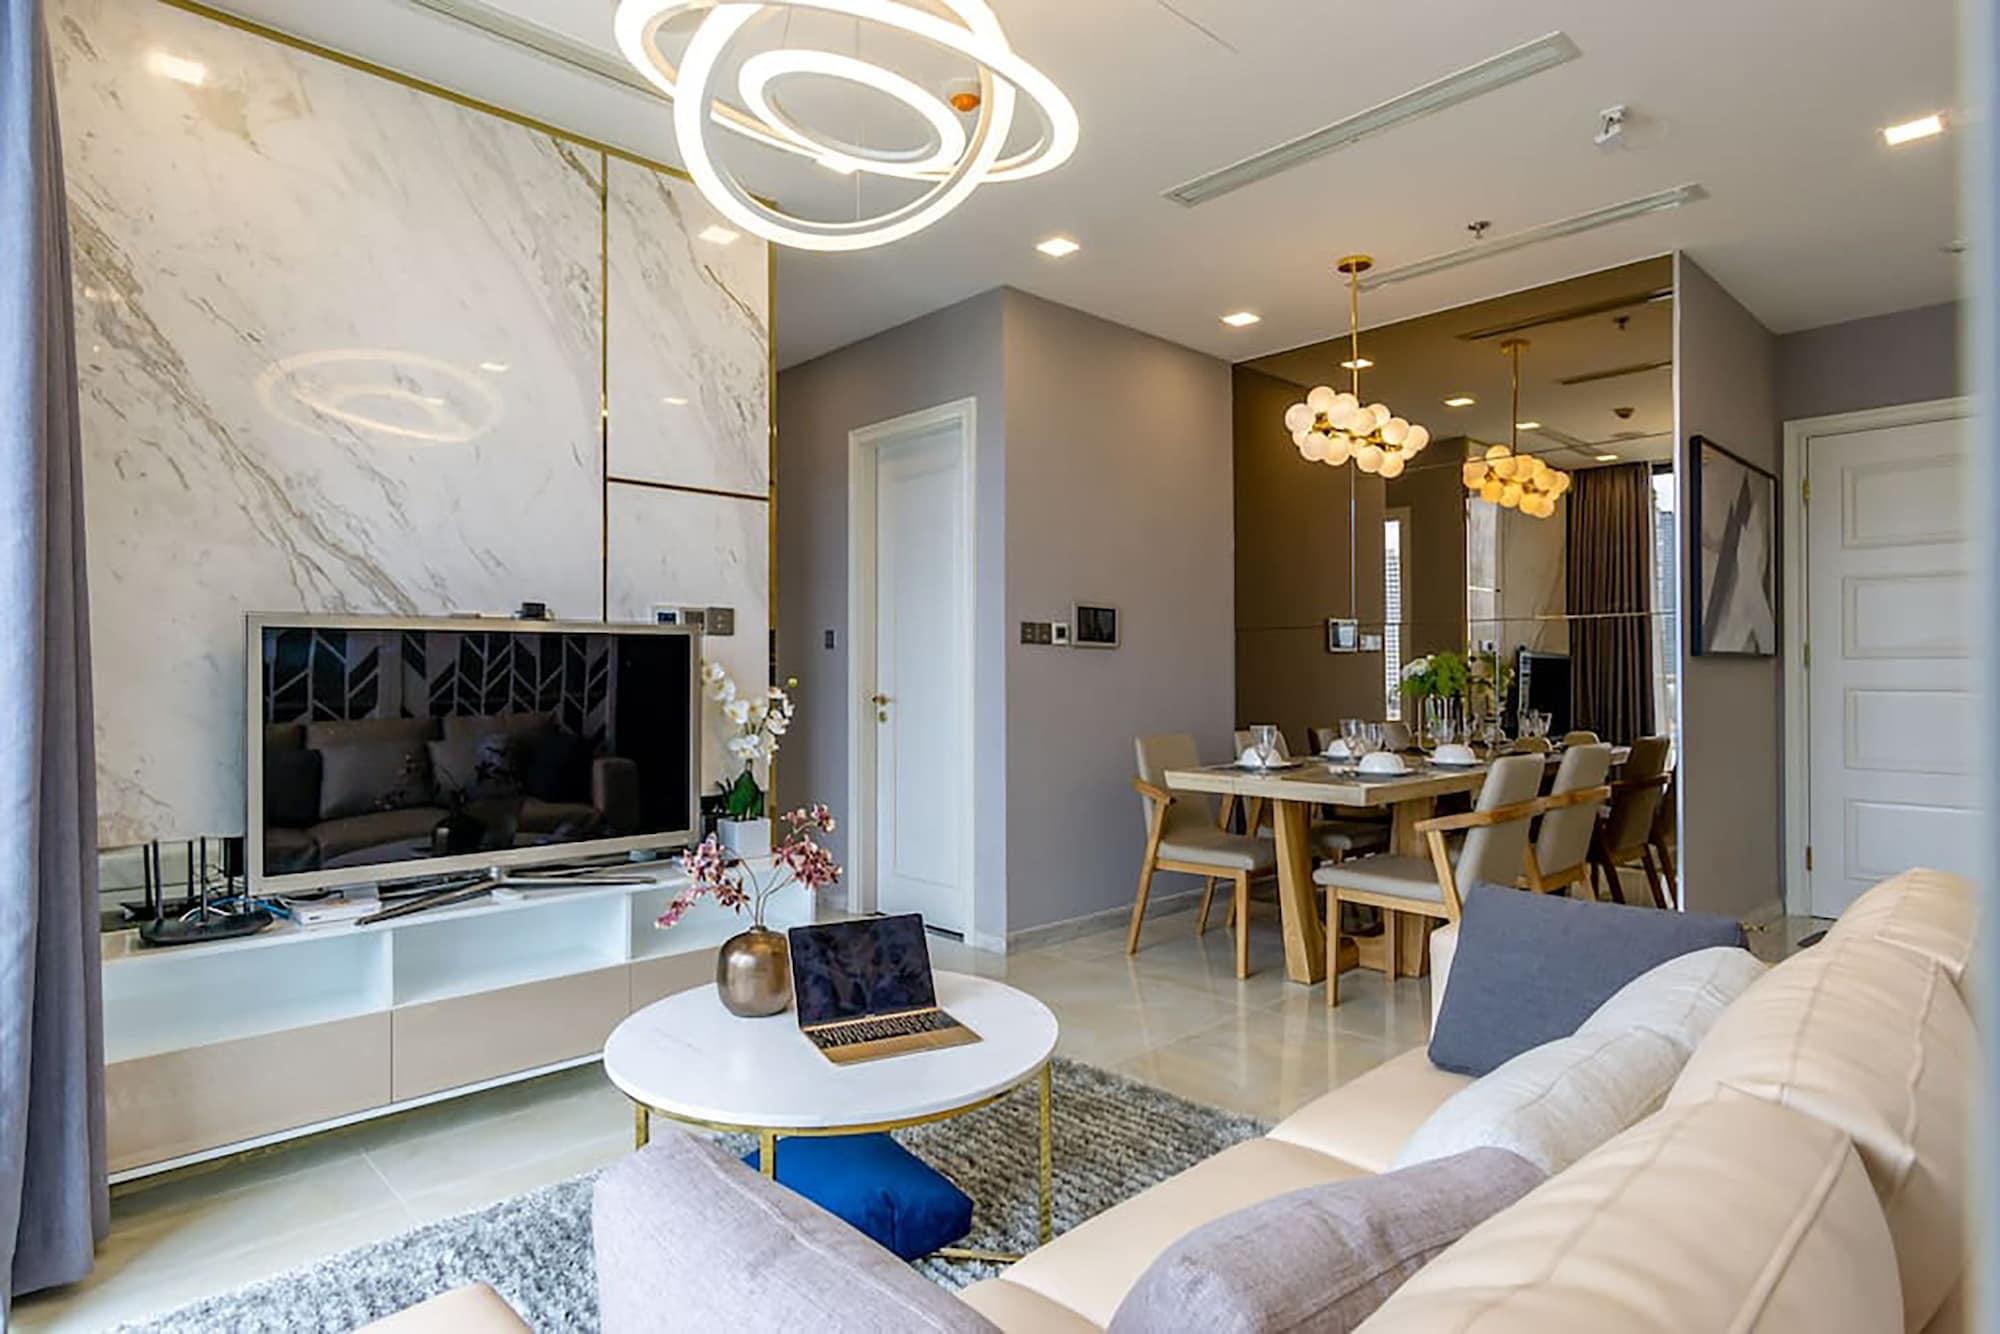 Mia Apartment 1 - ICON 56, Quận 4